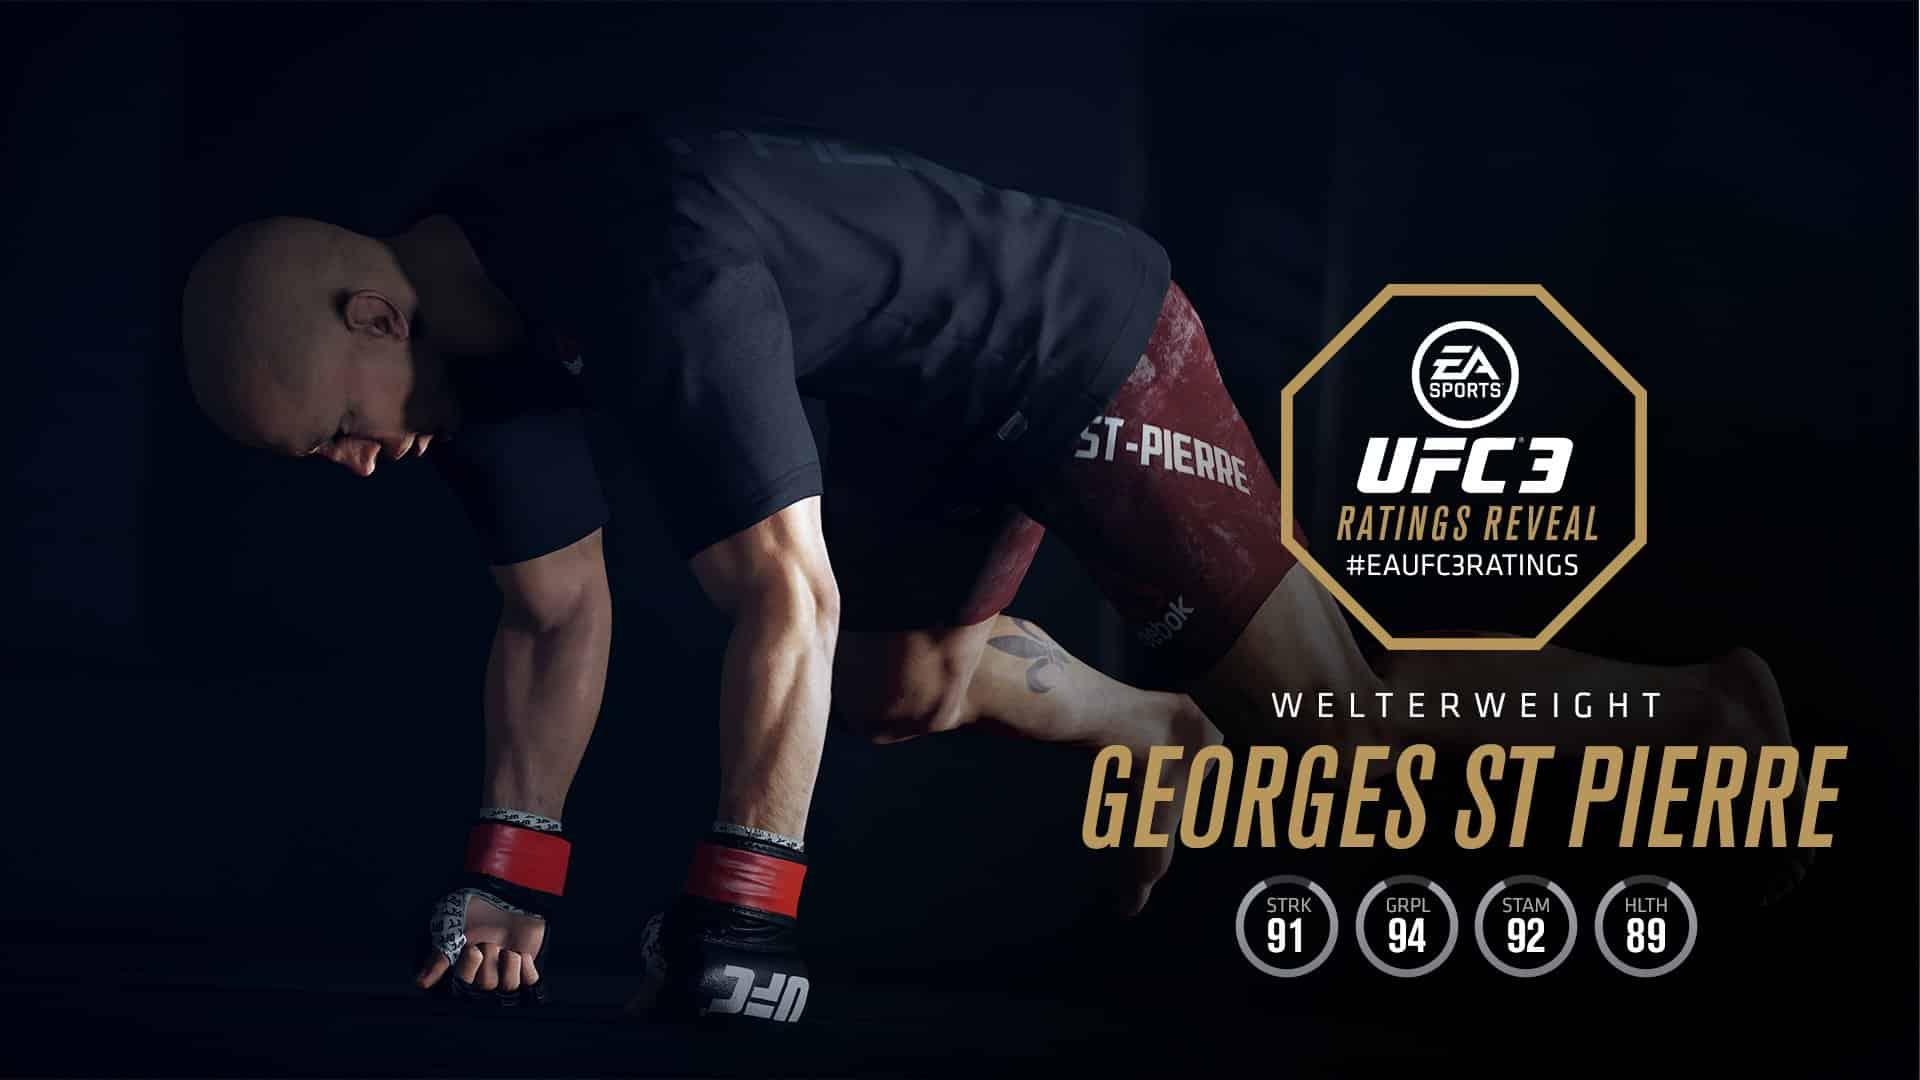 georges st pierre UFC 3